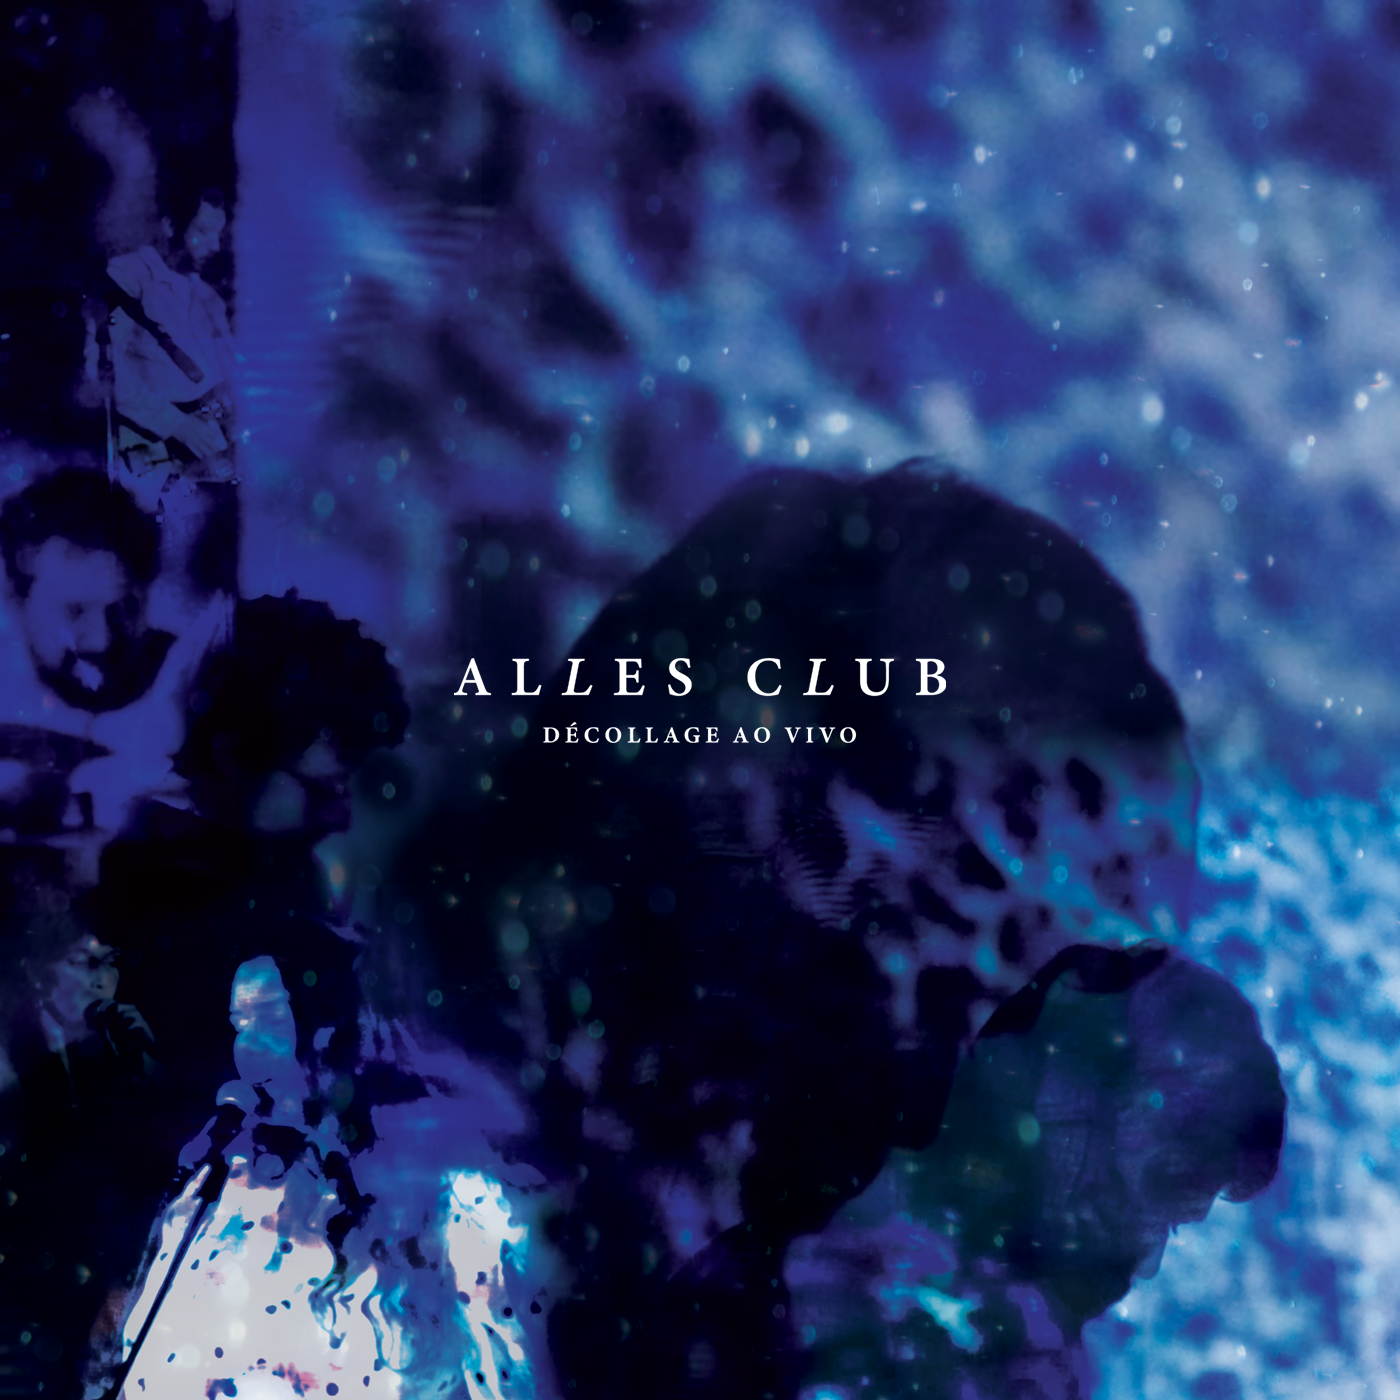 Cover developed for Alles Club's Album Décollage Ao Vivo